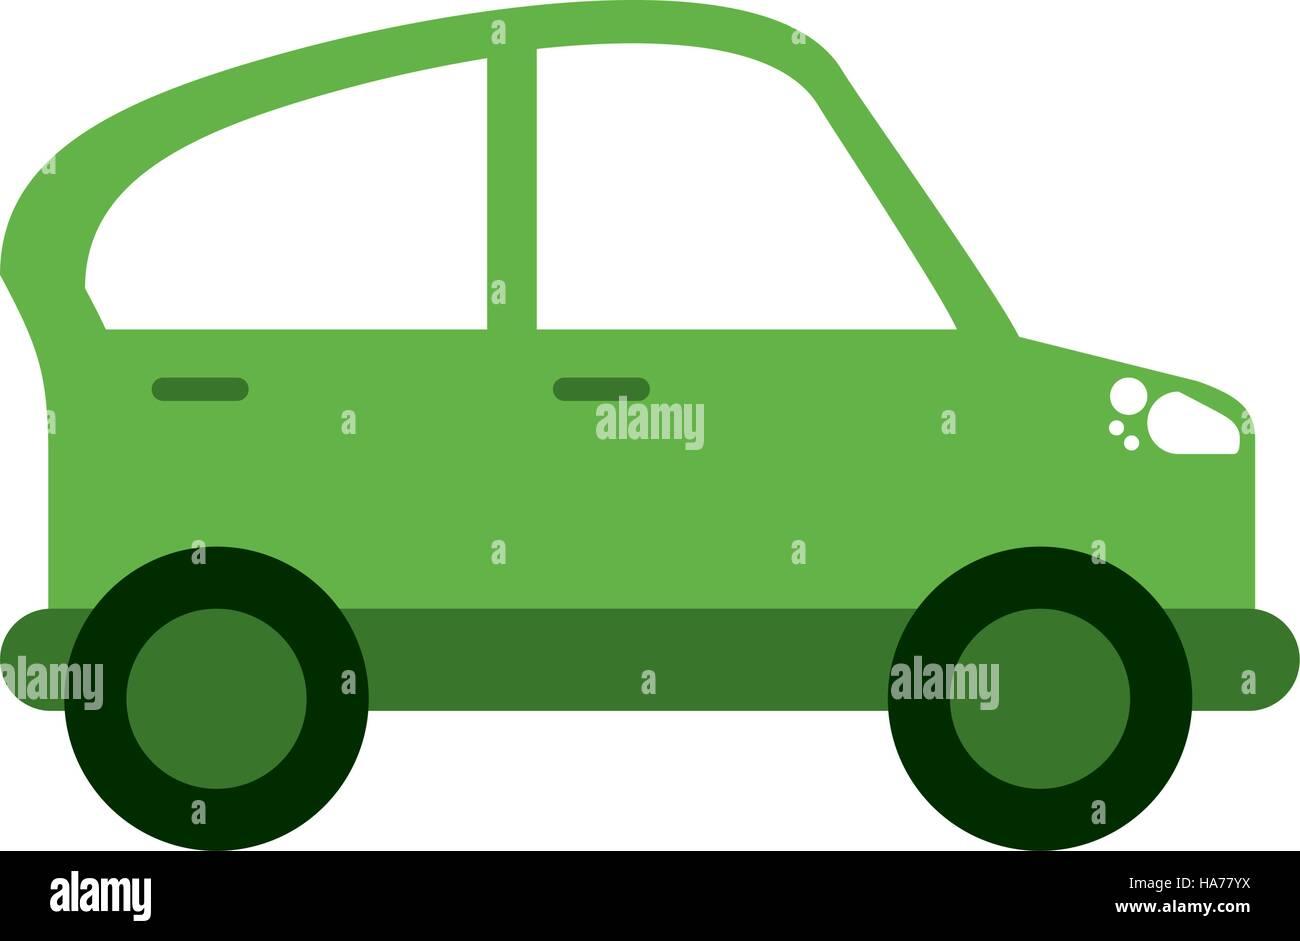 grünes Auto Transport Industrie Kontamination Symbol Stockbild